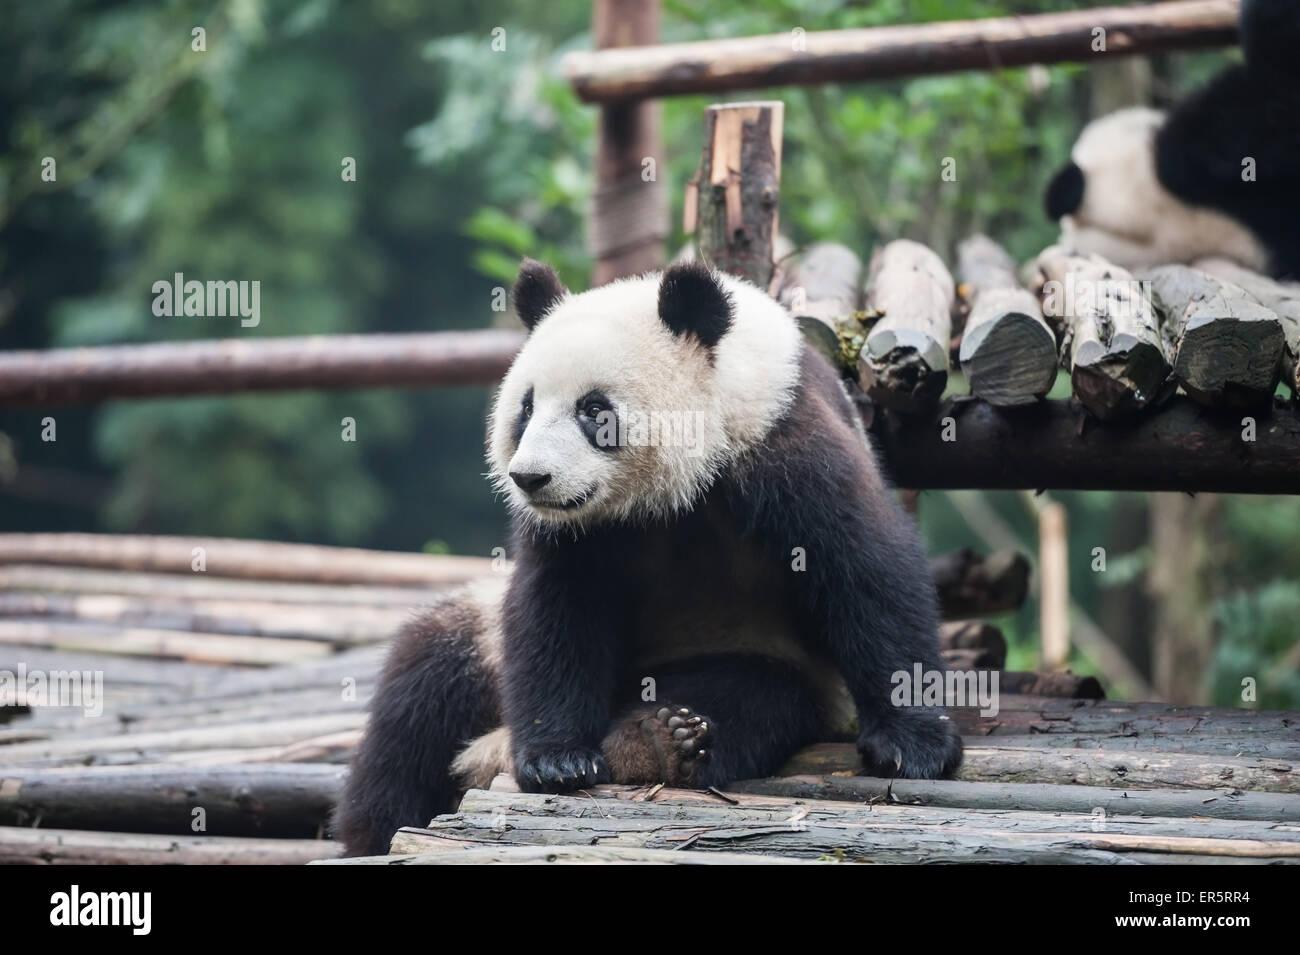 Panda in the jungle - Stock Image